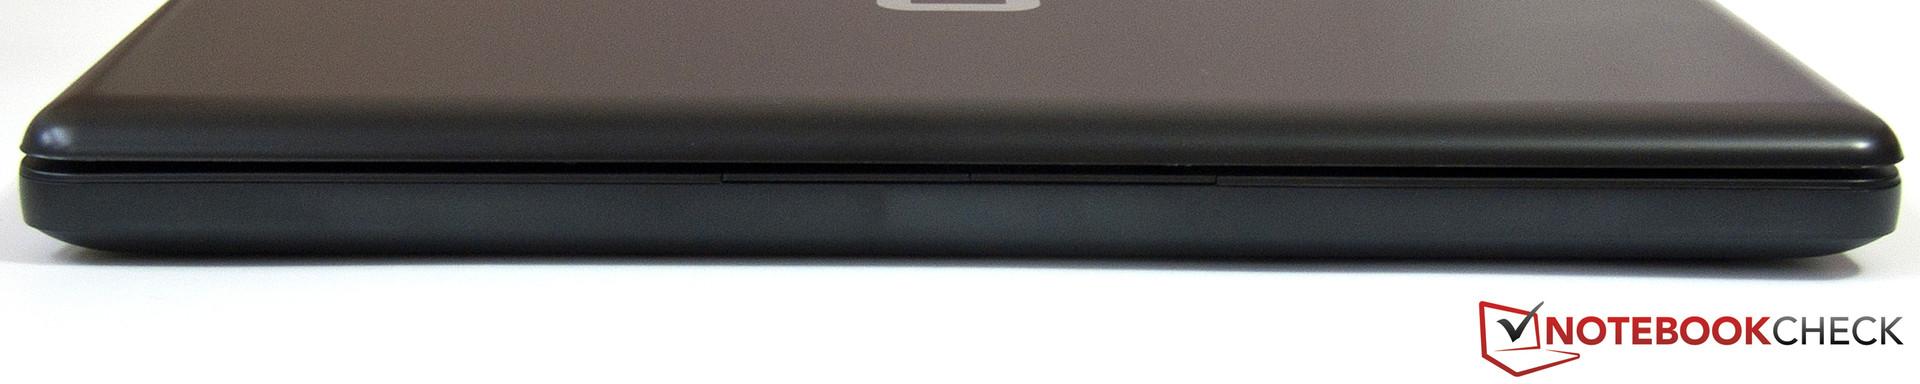 Compaq presario cq57 sd card reader